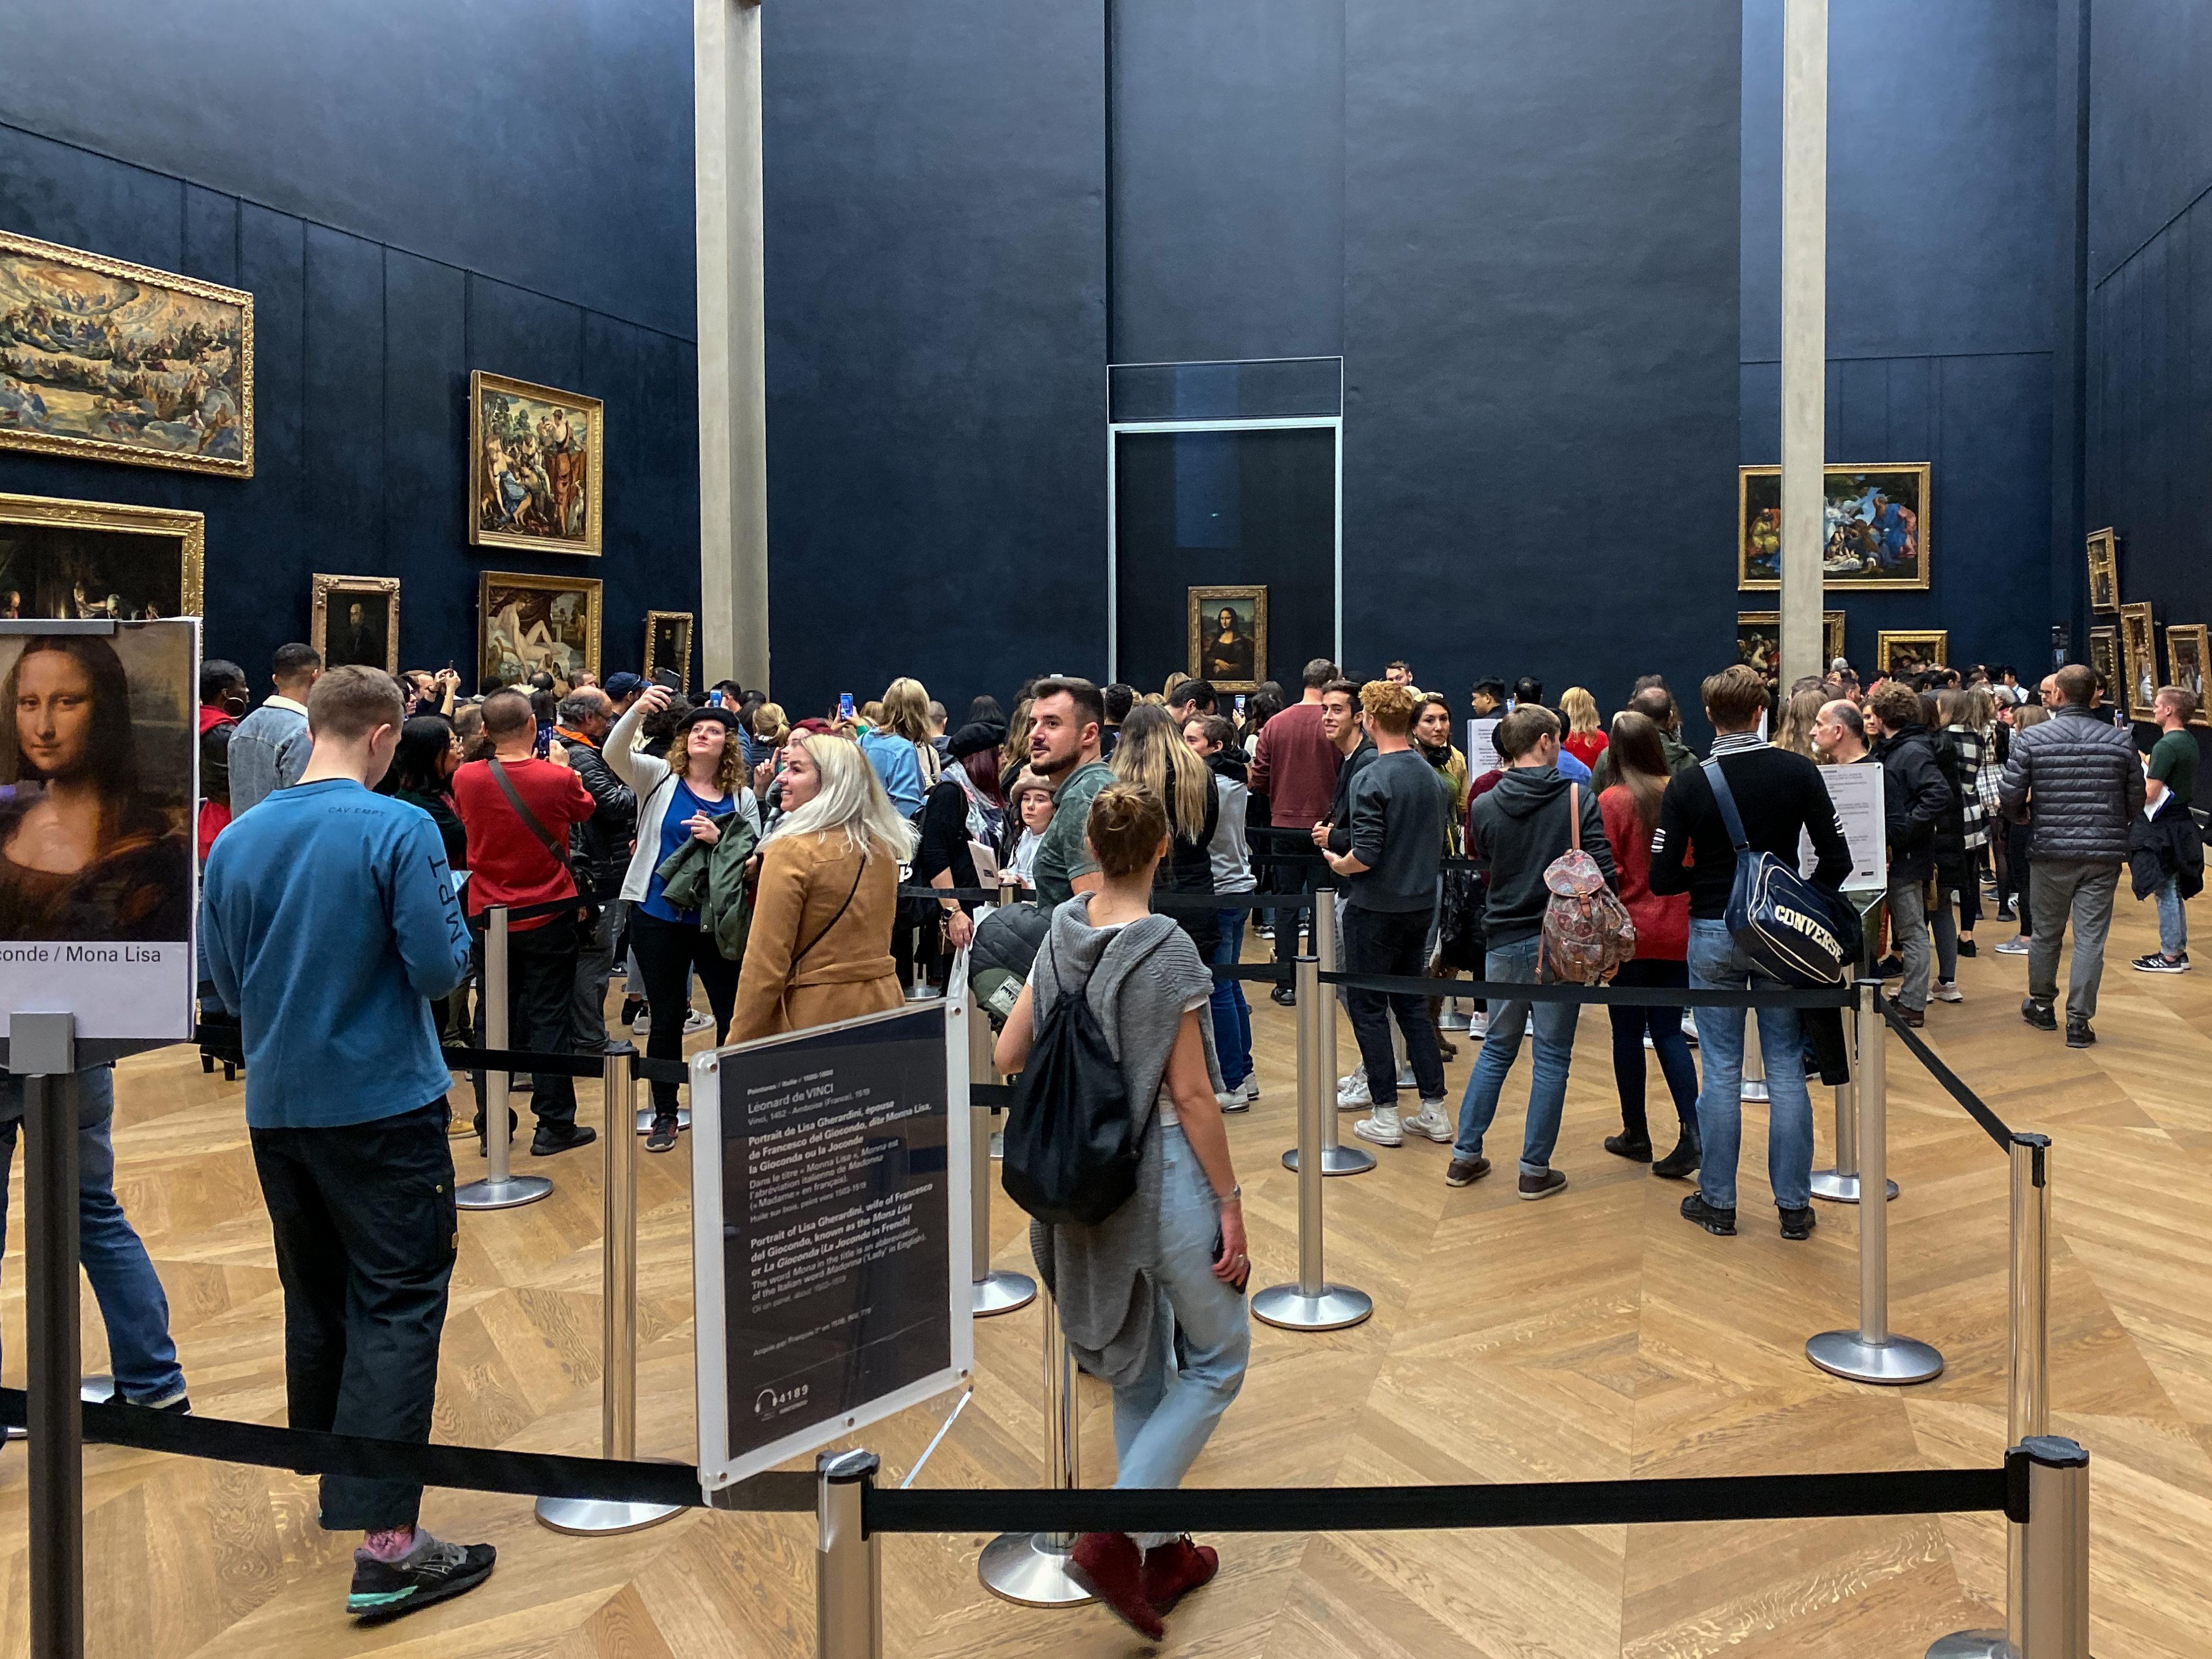 Mona Lisa_Saal Louvre 1